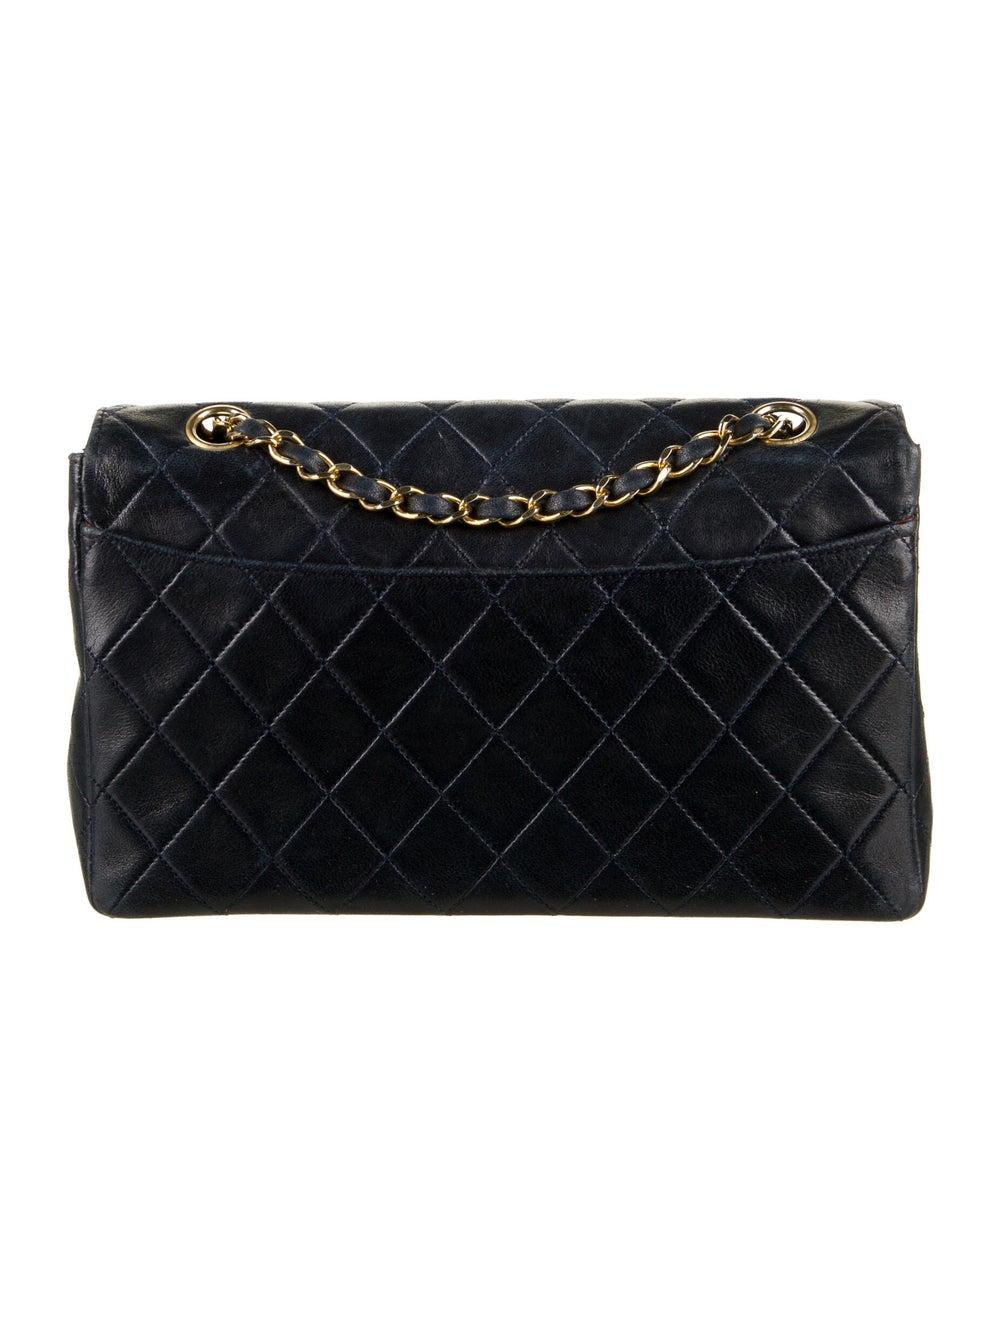 Chanel Vintage Quilted Flap Bag Blue - image 4